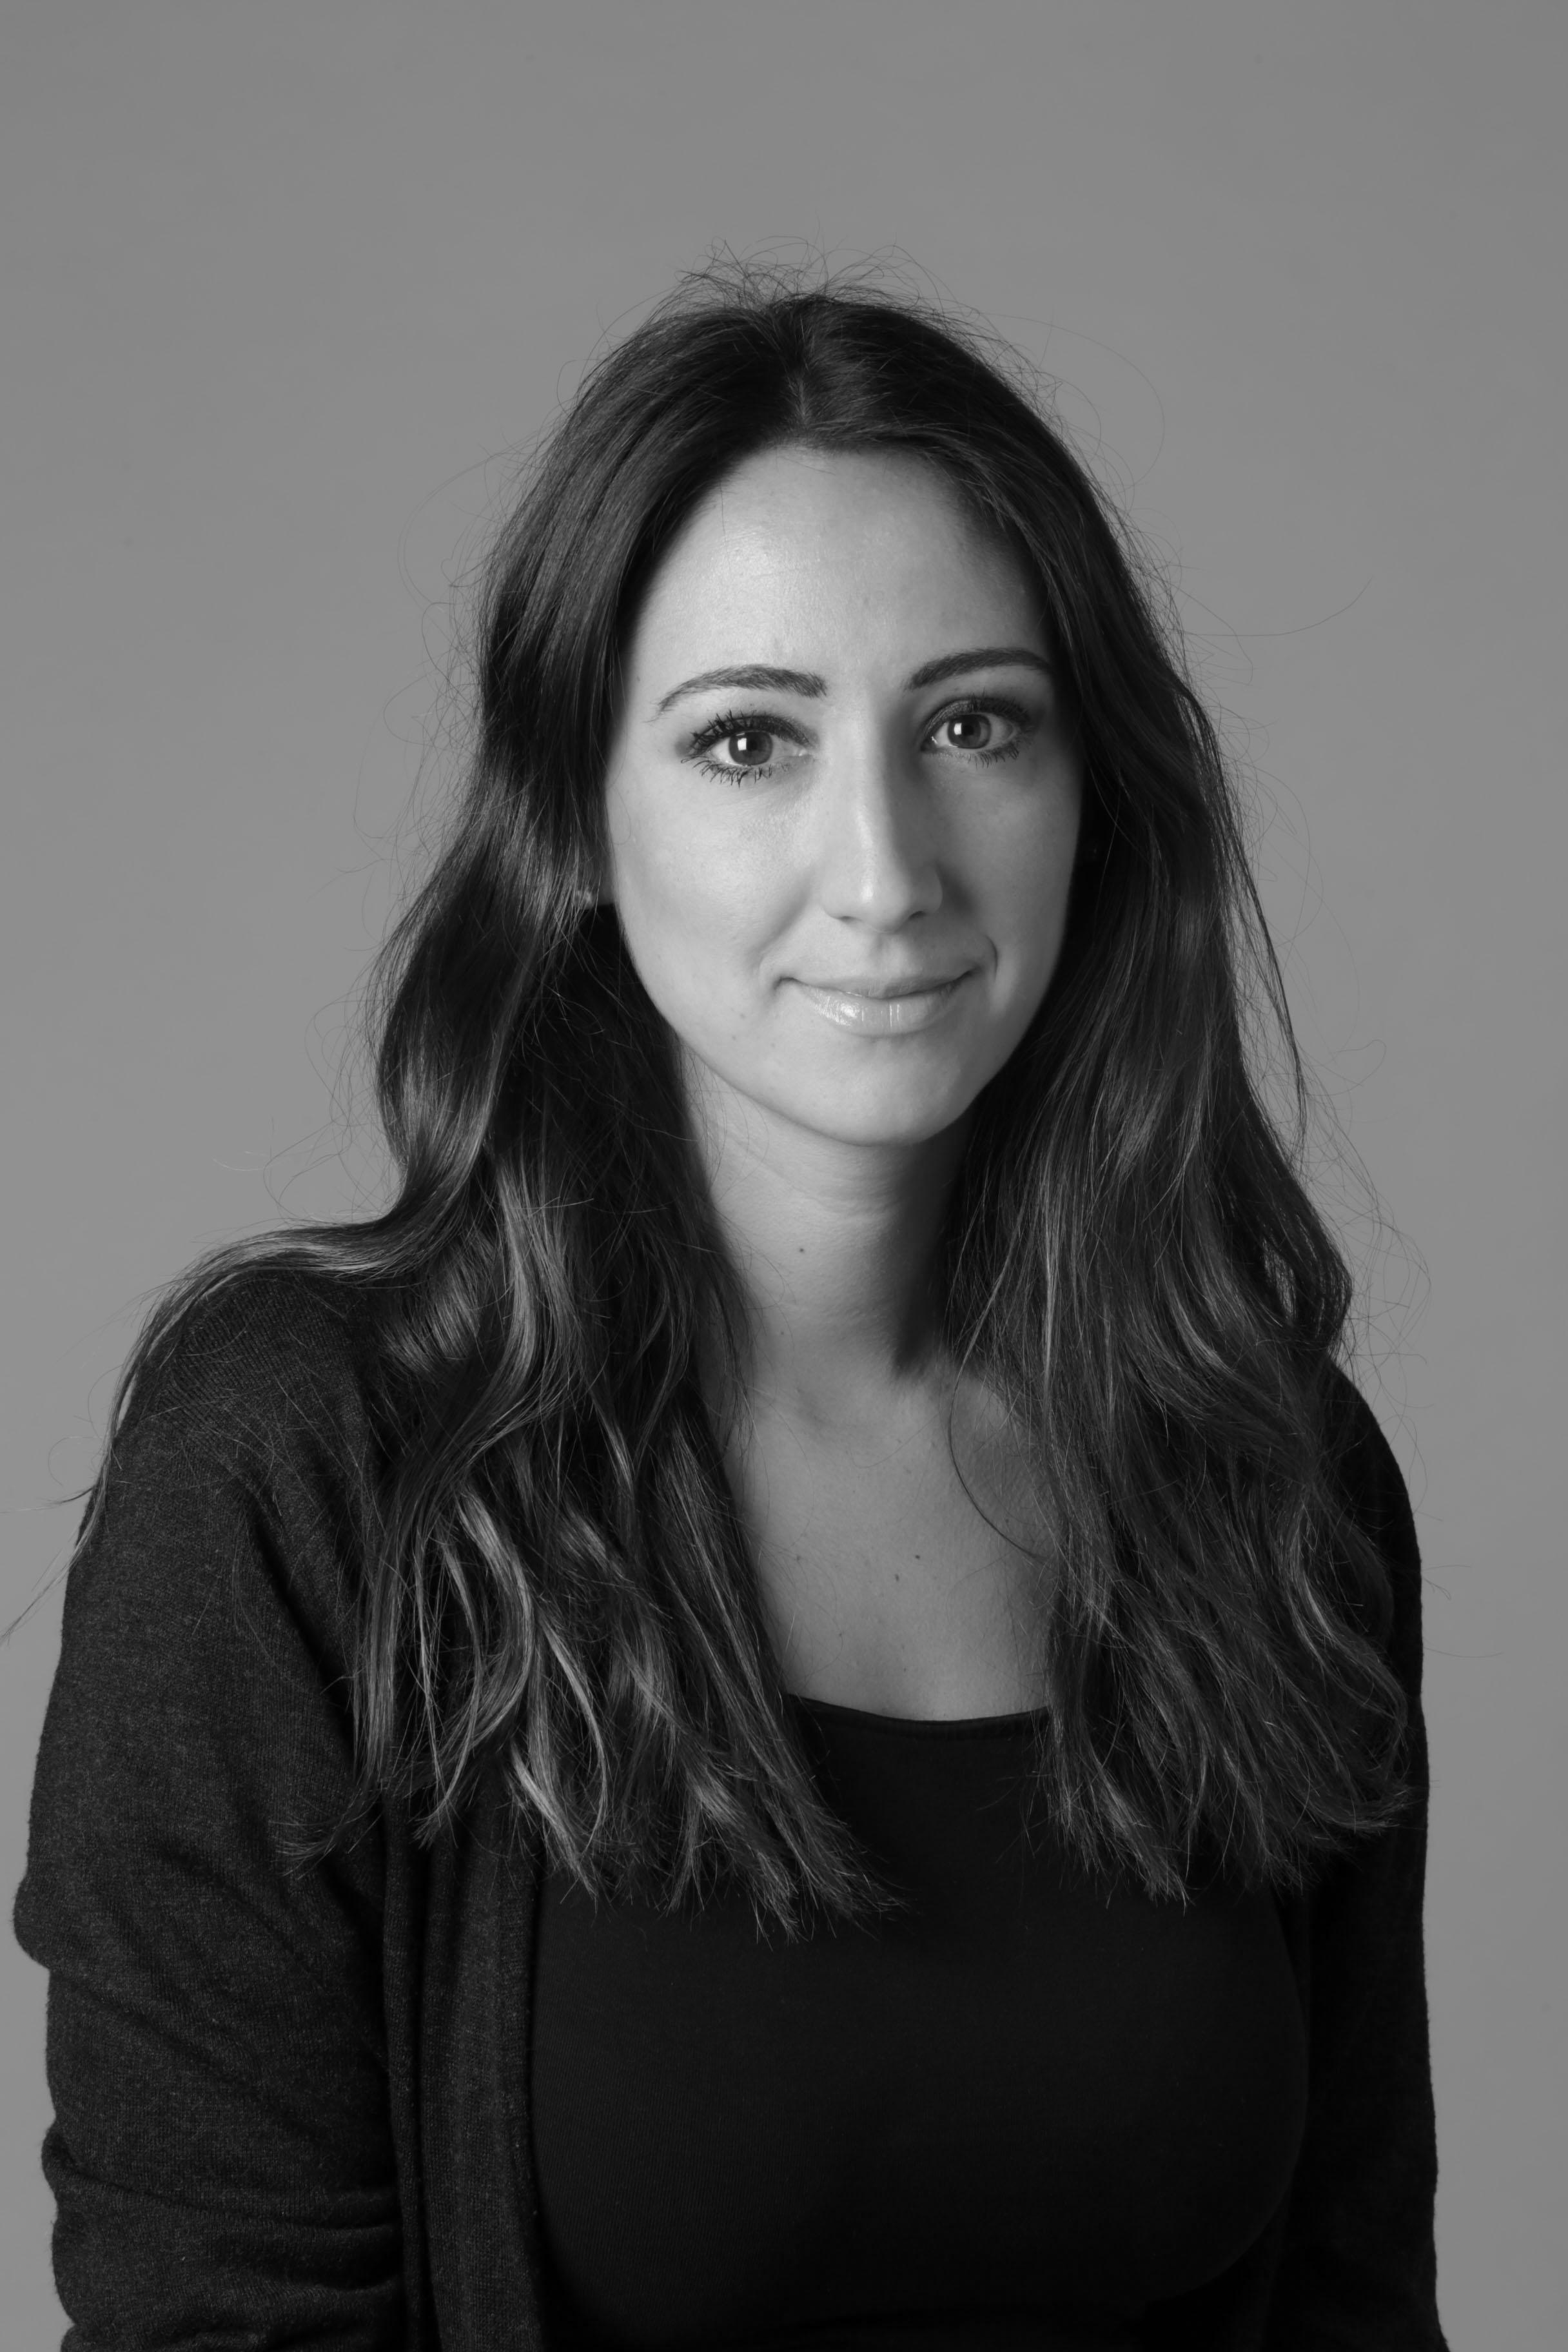 Chloe Duran